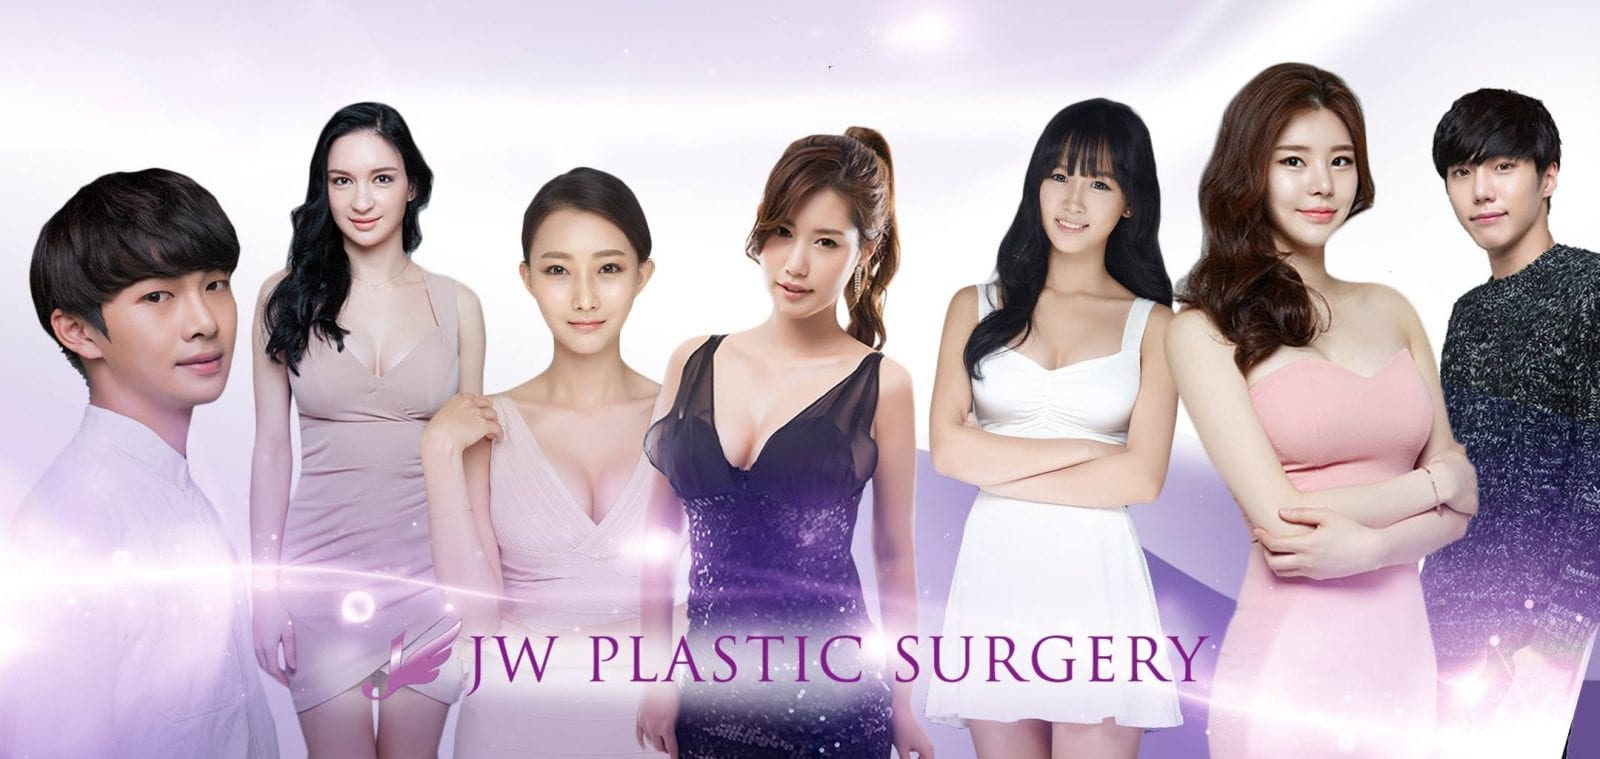 JW Plastic Surgery | Gangnam-gu, Seoul